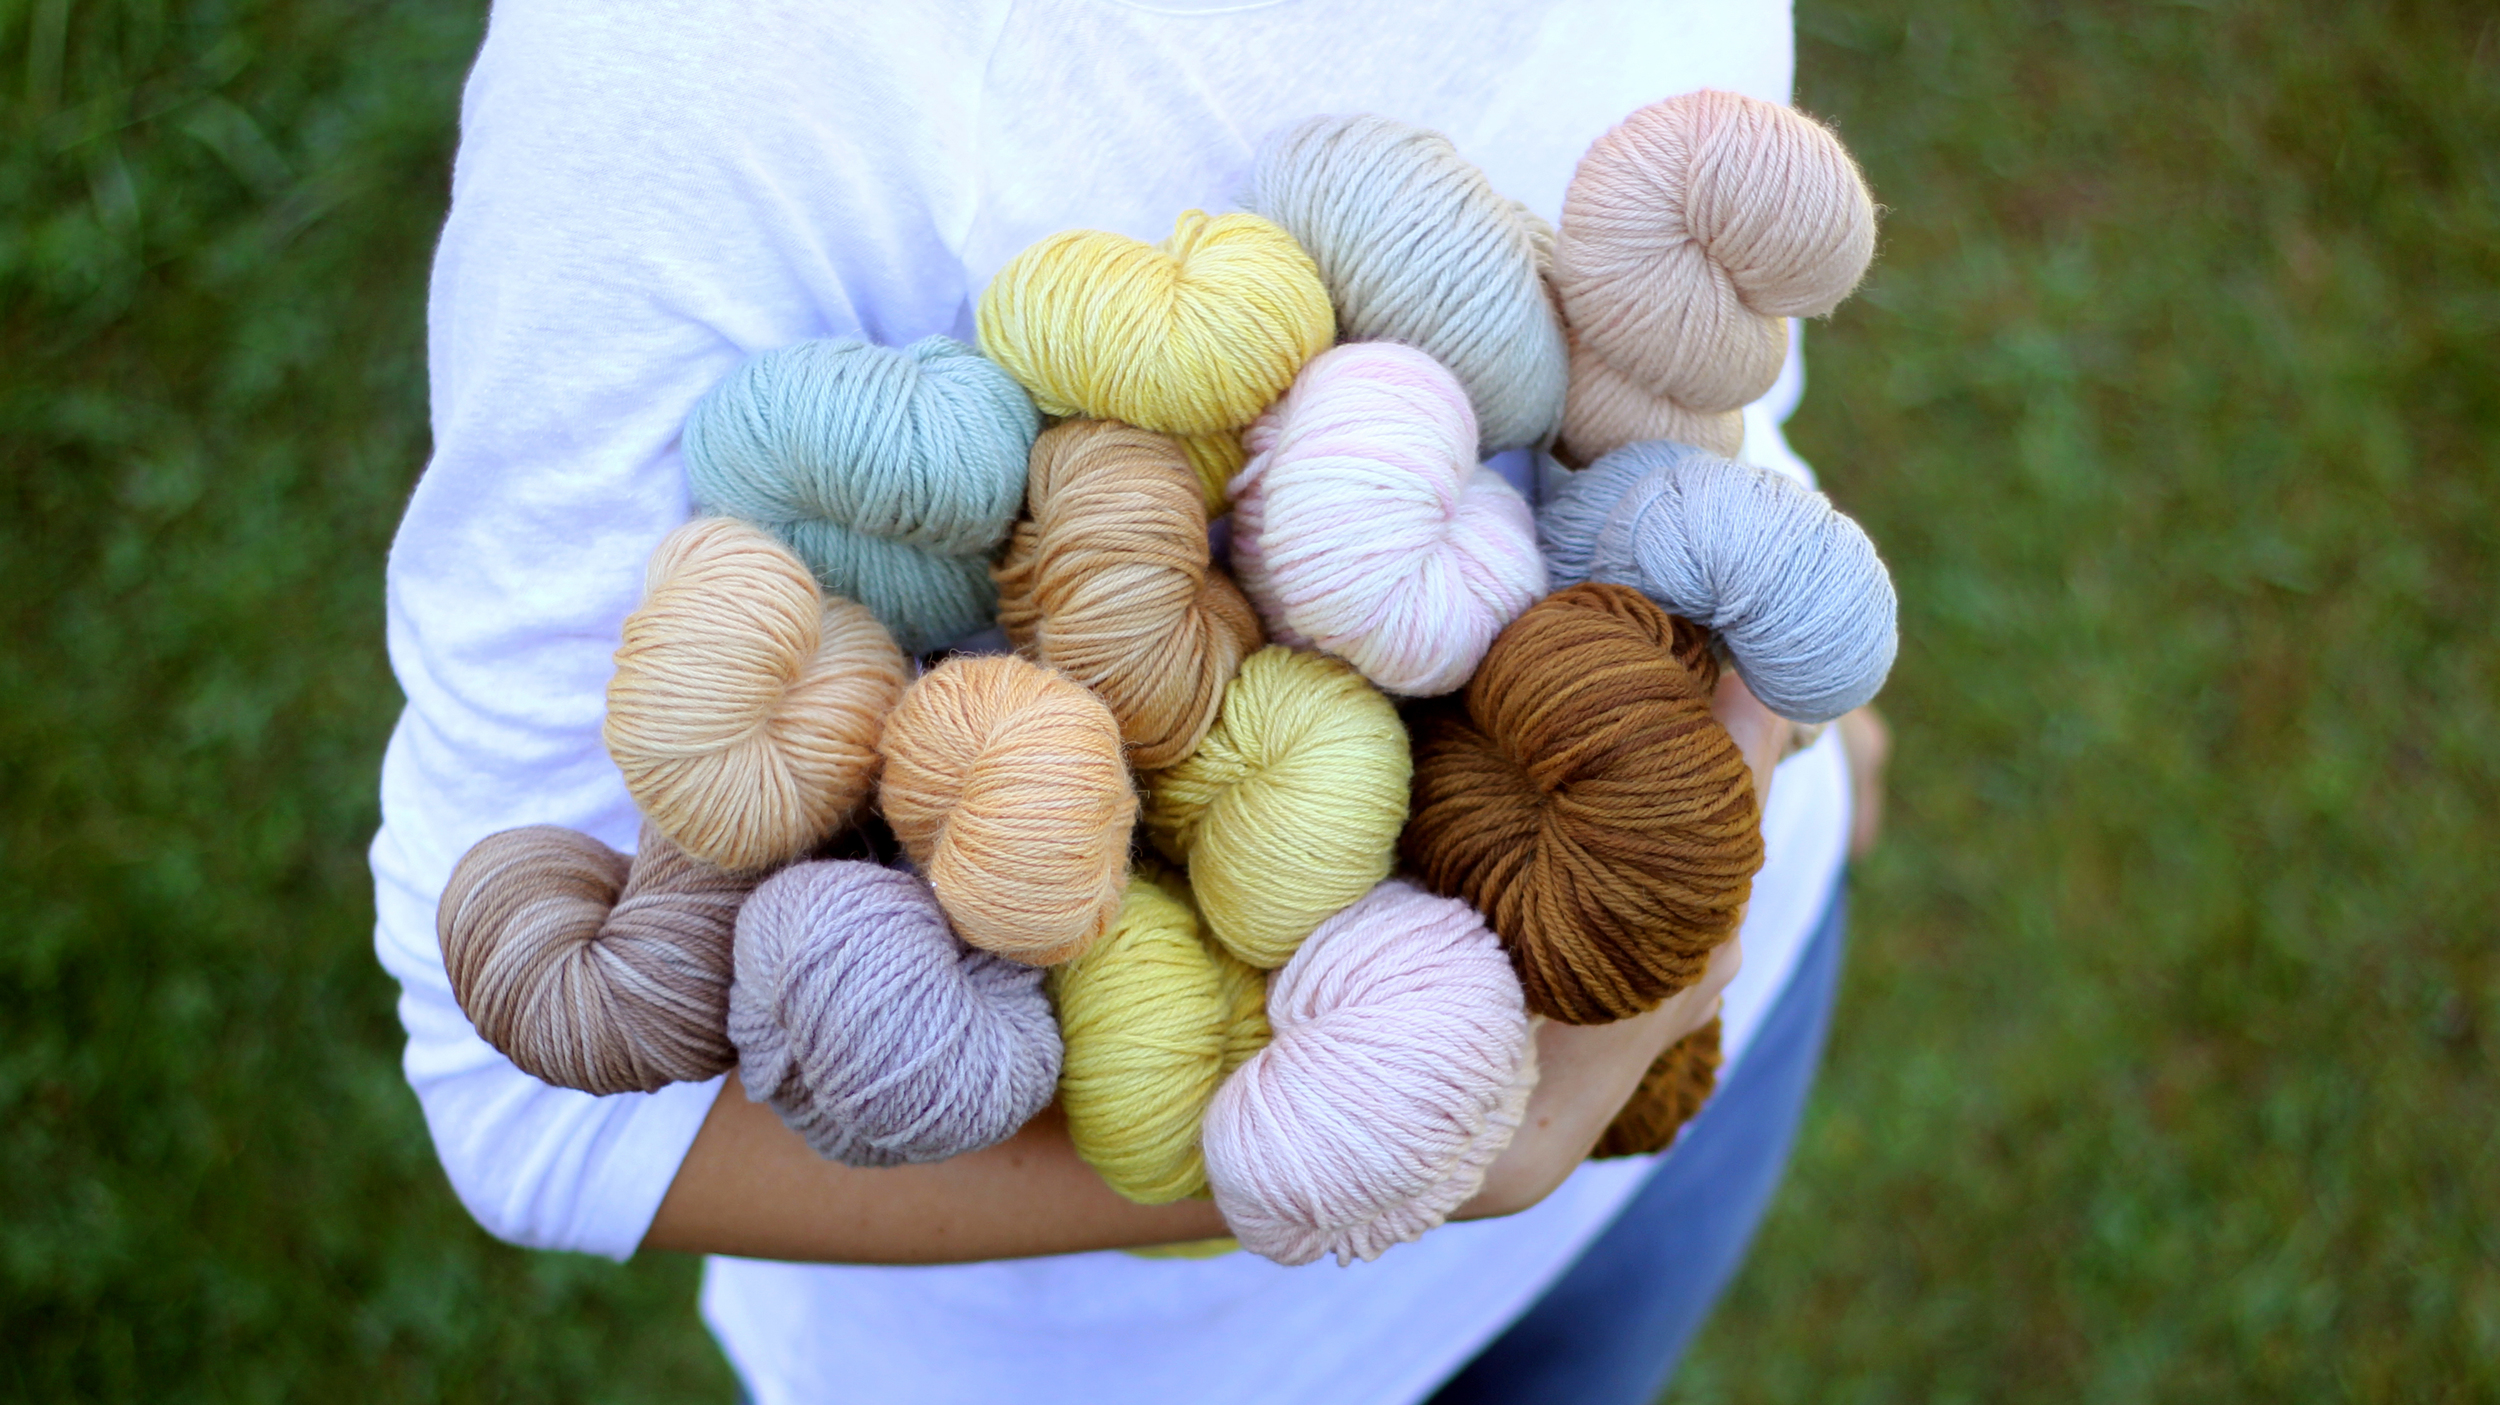 arm of yarn BV.JPG